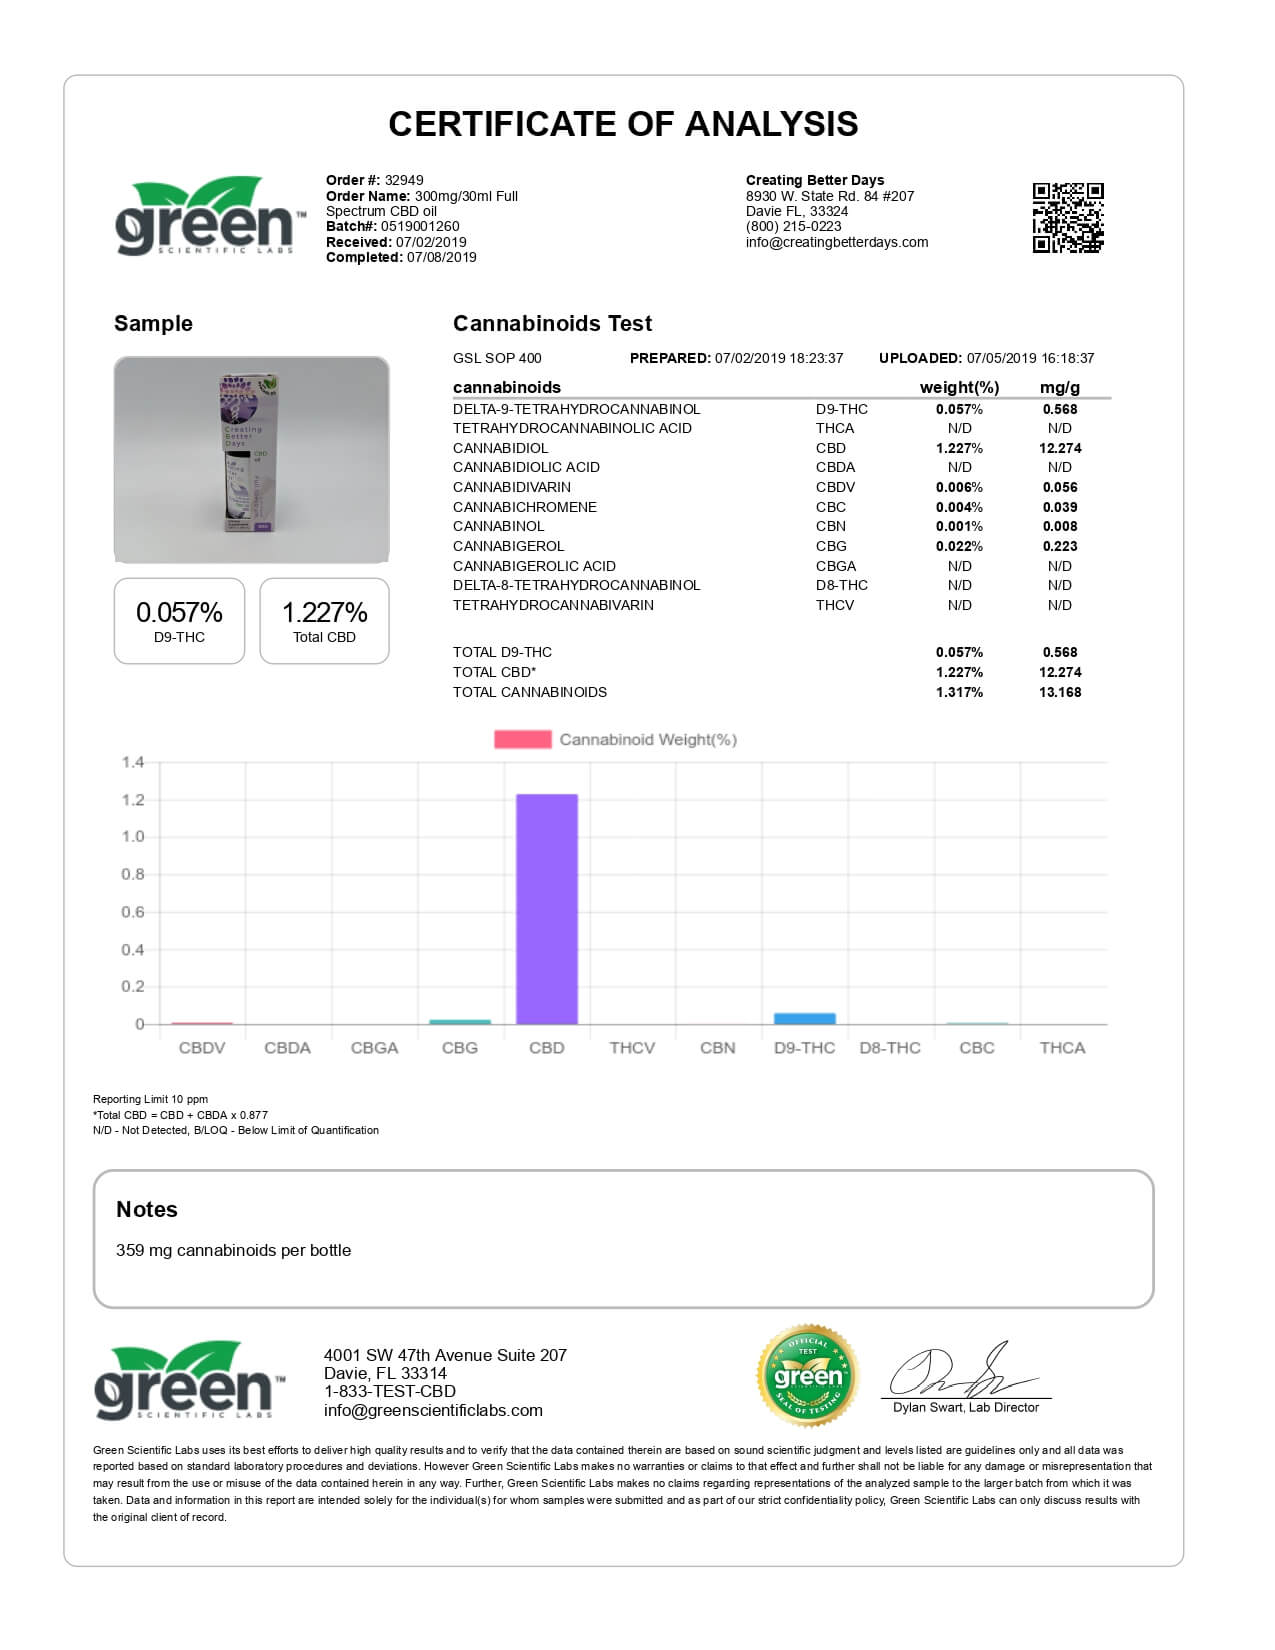 Creating Better Days CBD Tincture Full Spectrum Oil 300mg Lab Report